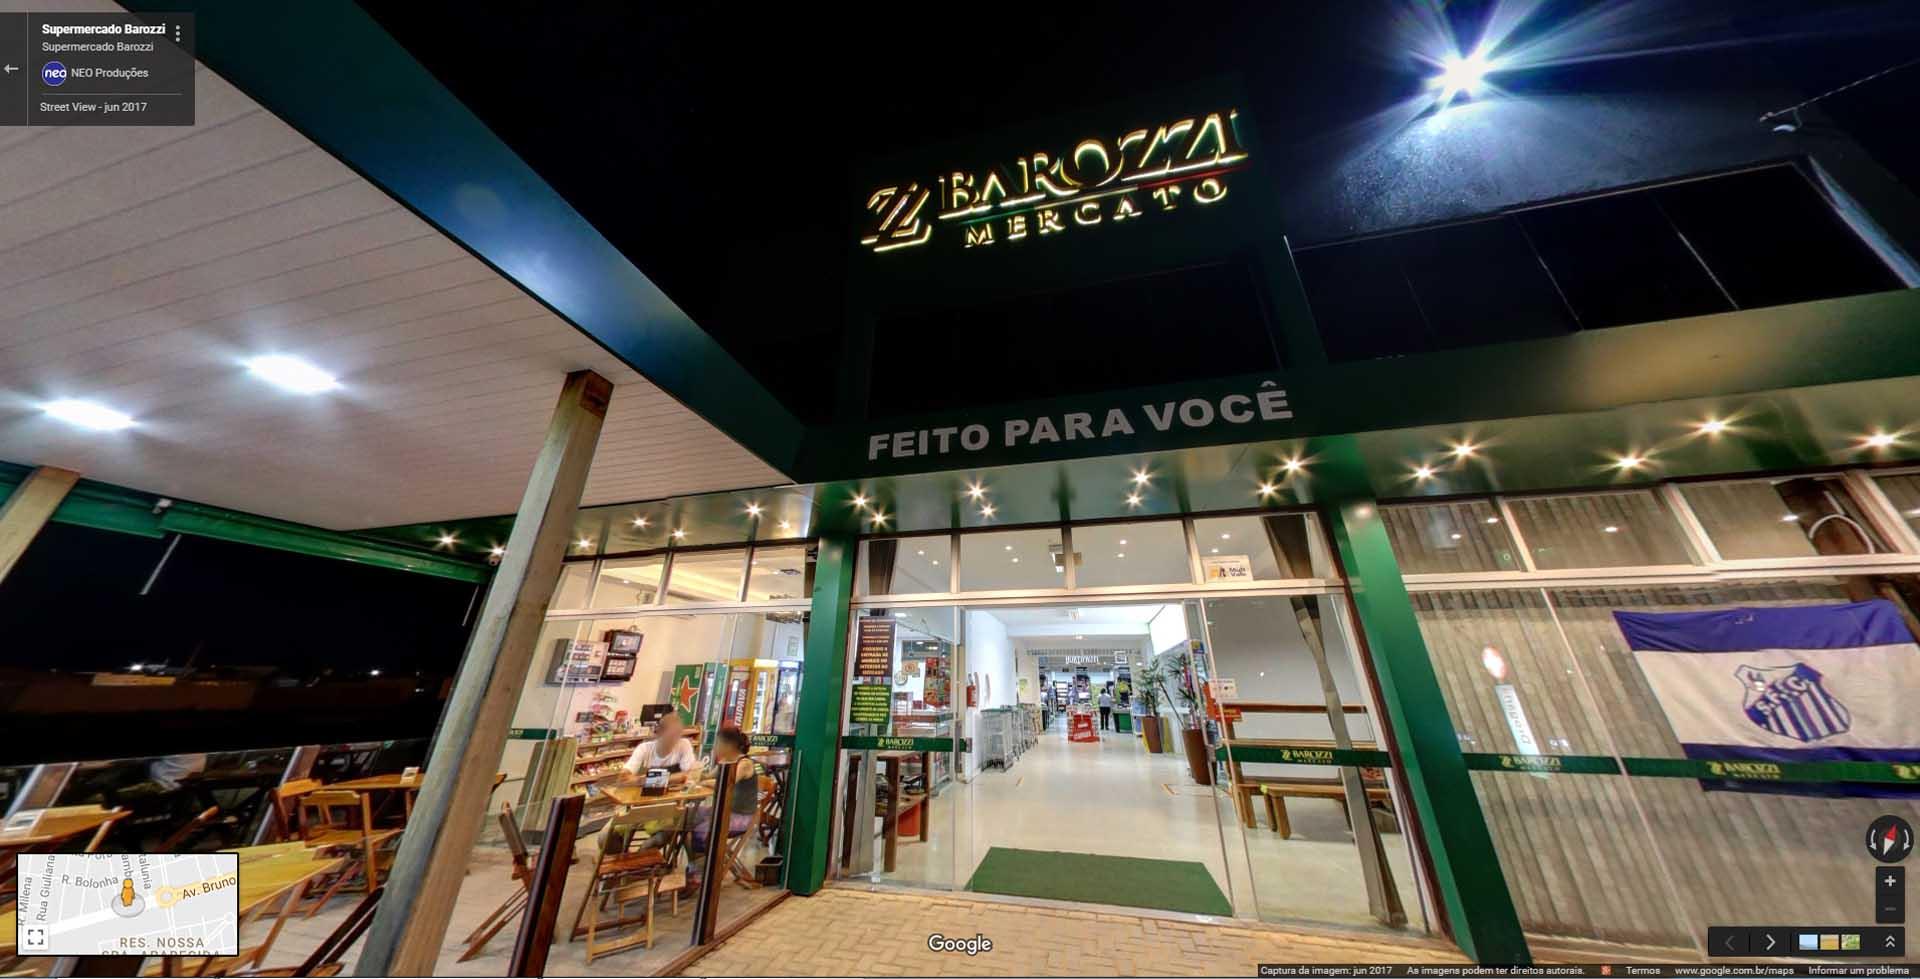 Supermercado Barozzi